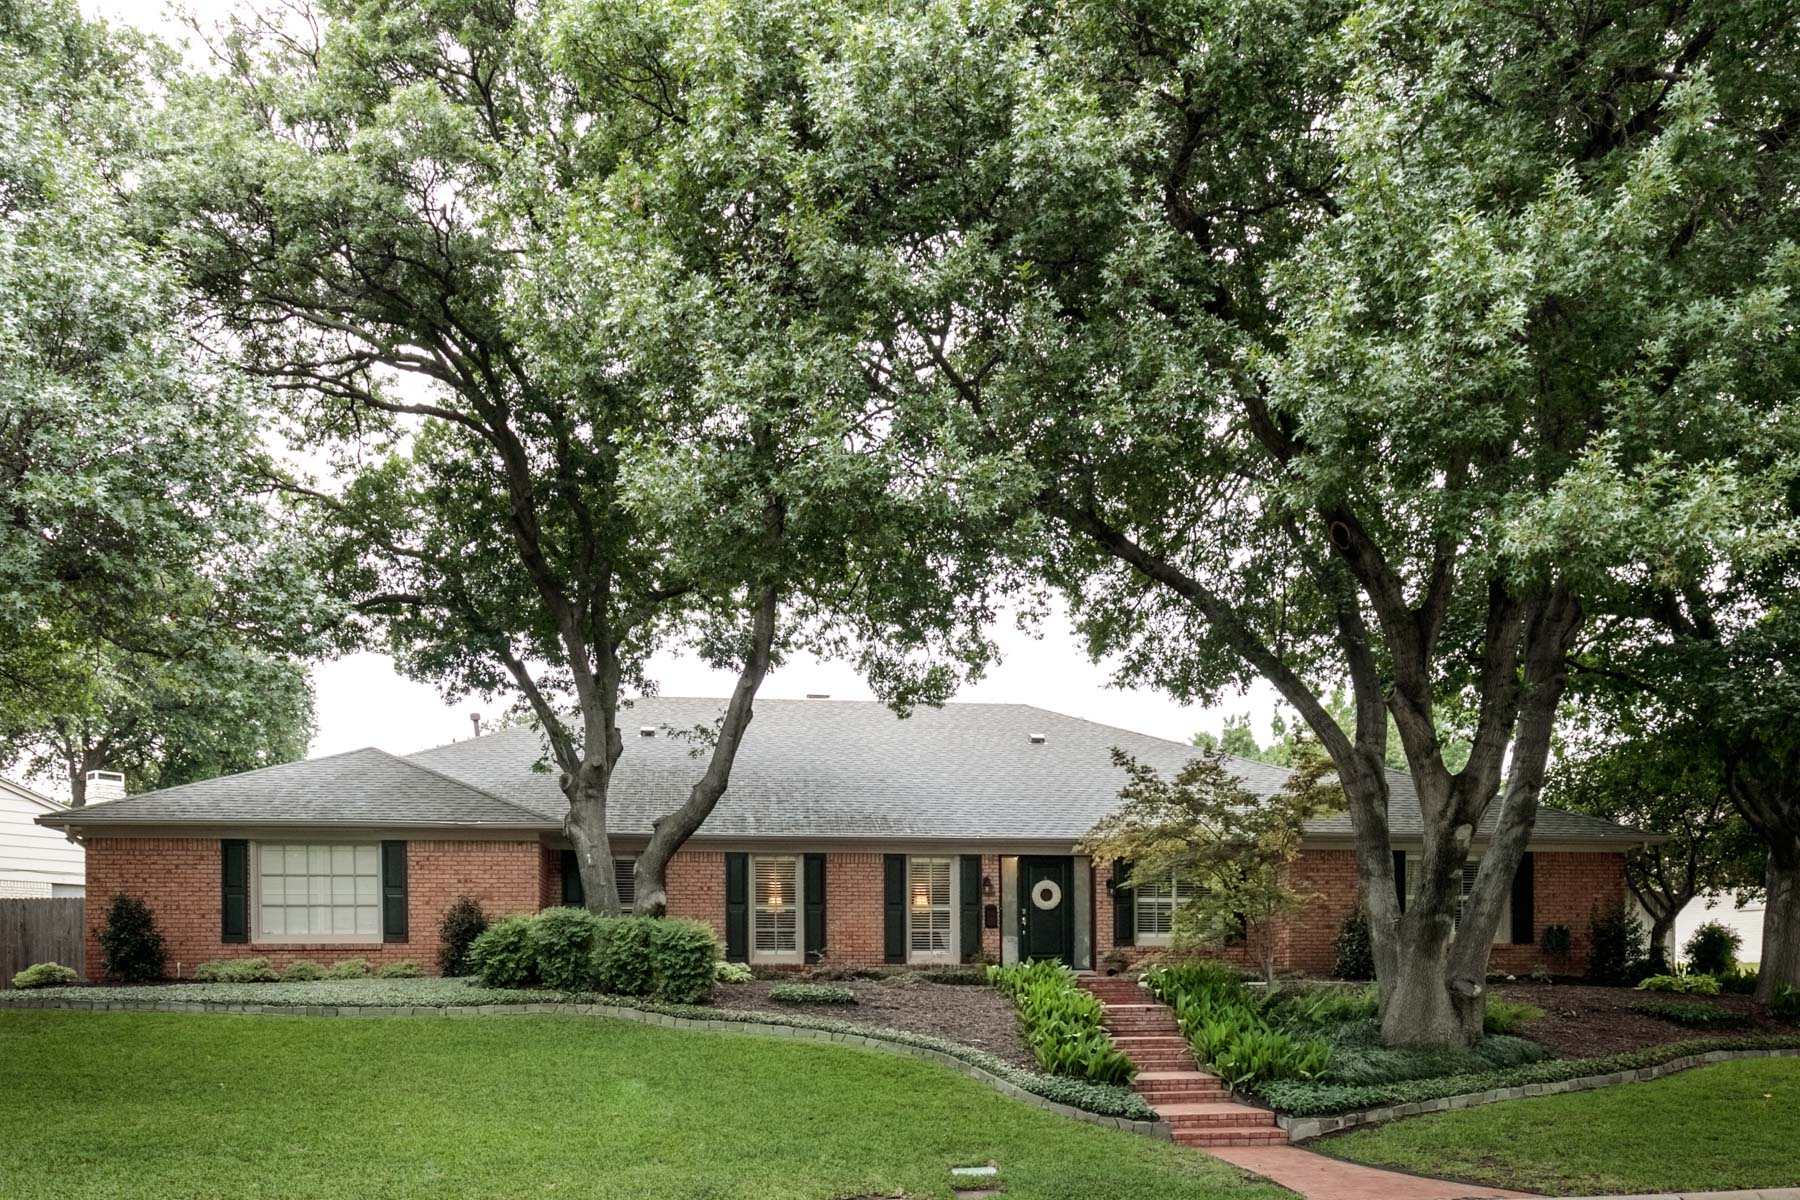 Moradia para Venda às Quiet Culdesac Loacation in Tanglewood 4416 Summercrest Ct Fort Worth, Texas, 76109 Estados Unidos